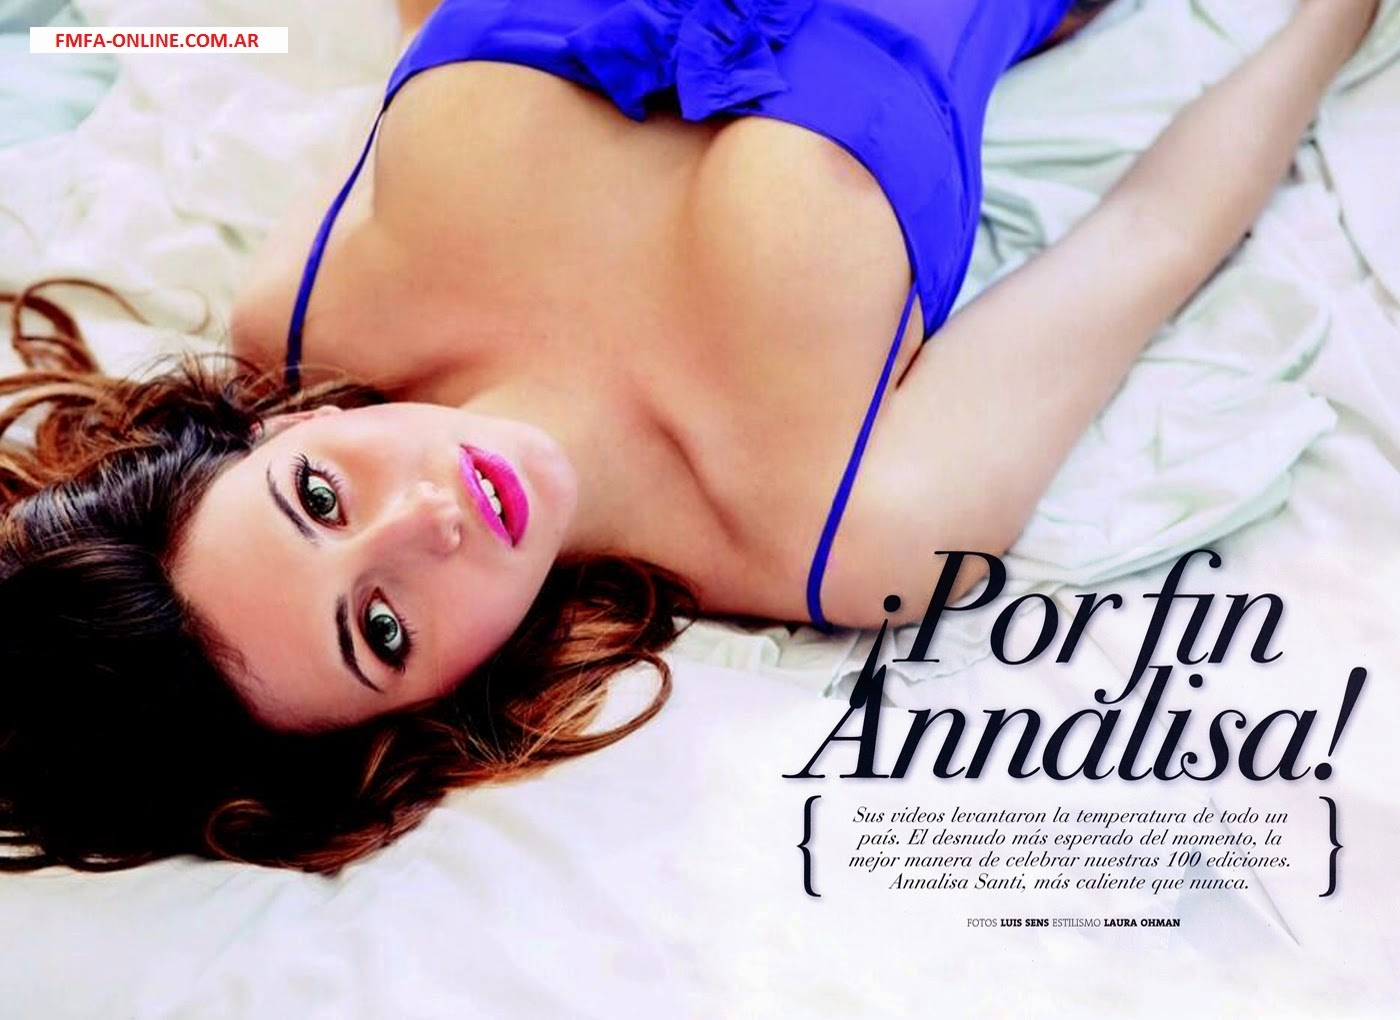 Annalisa Santi Nude In Playboy